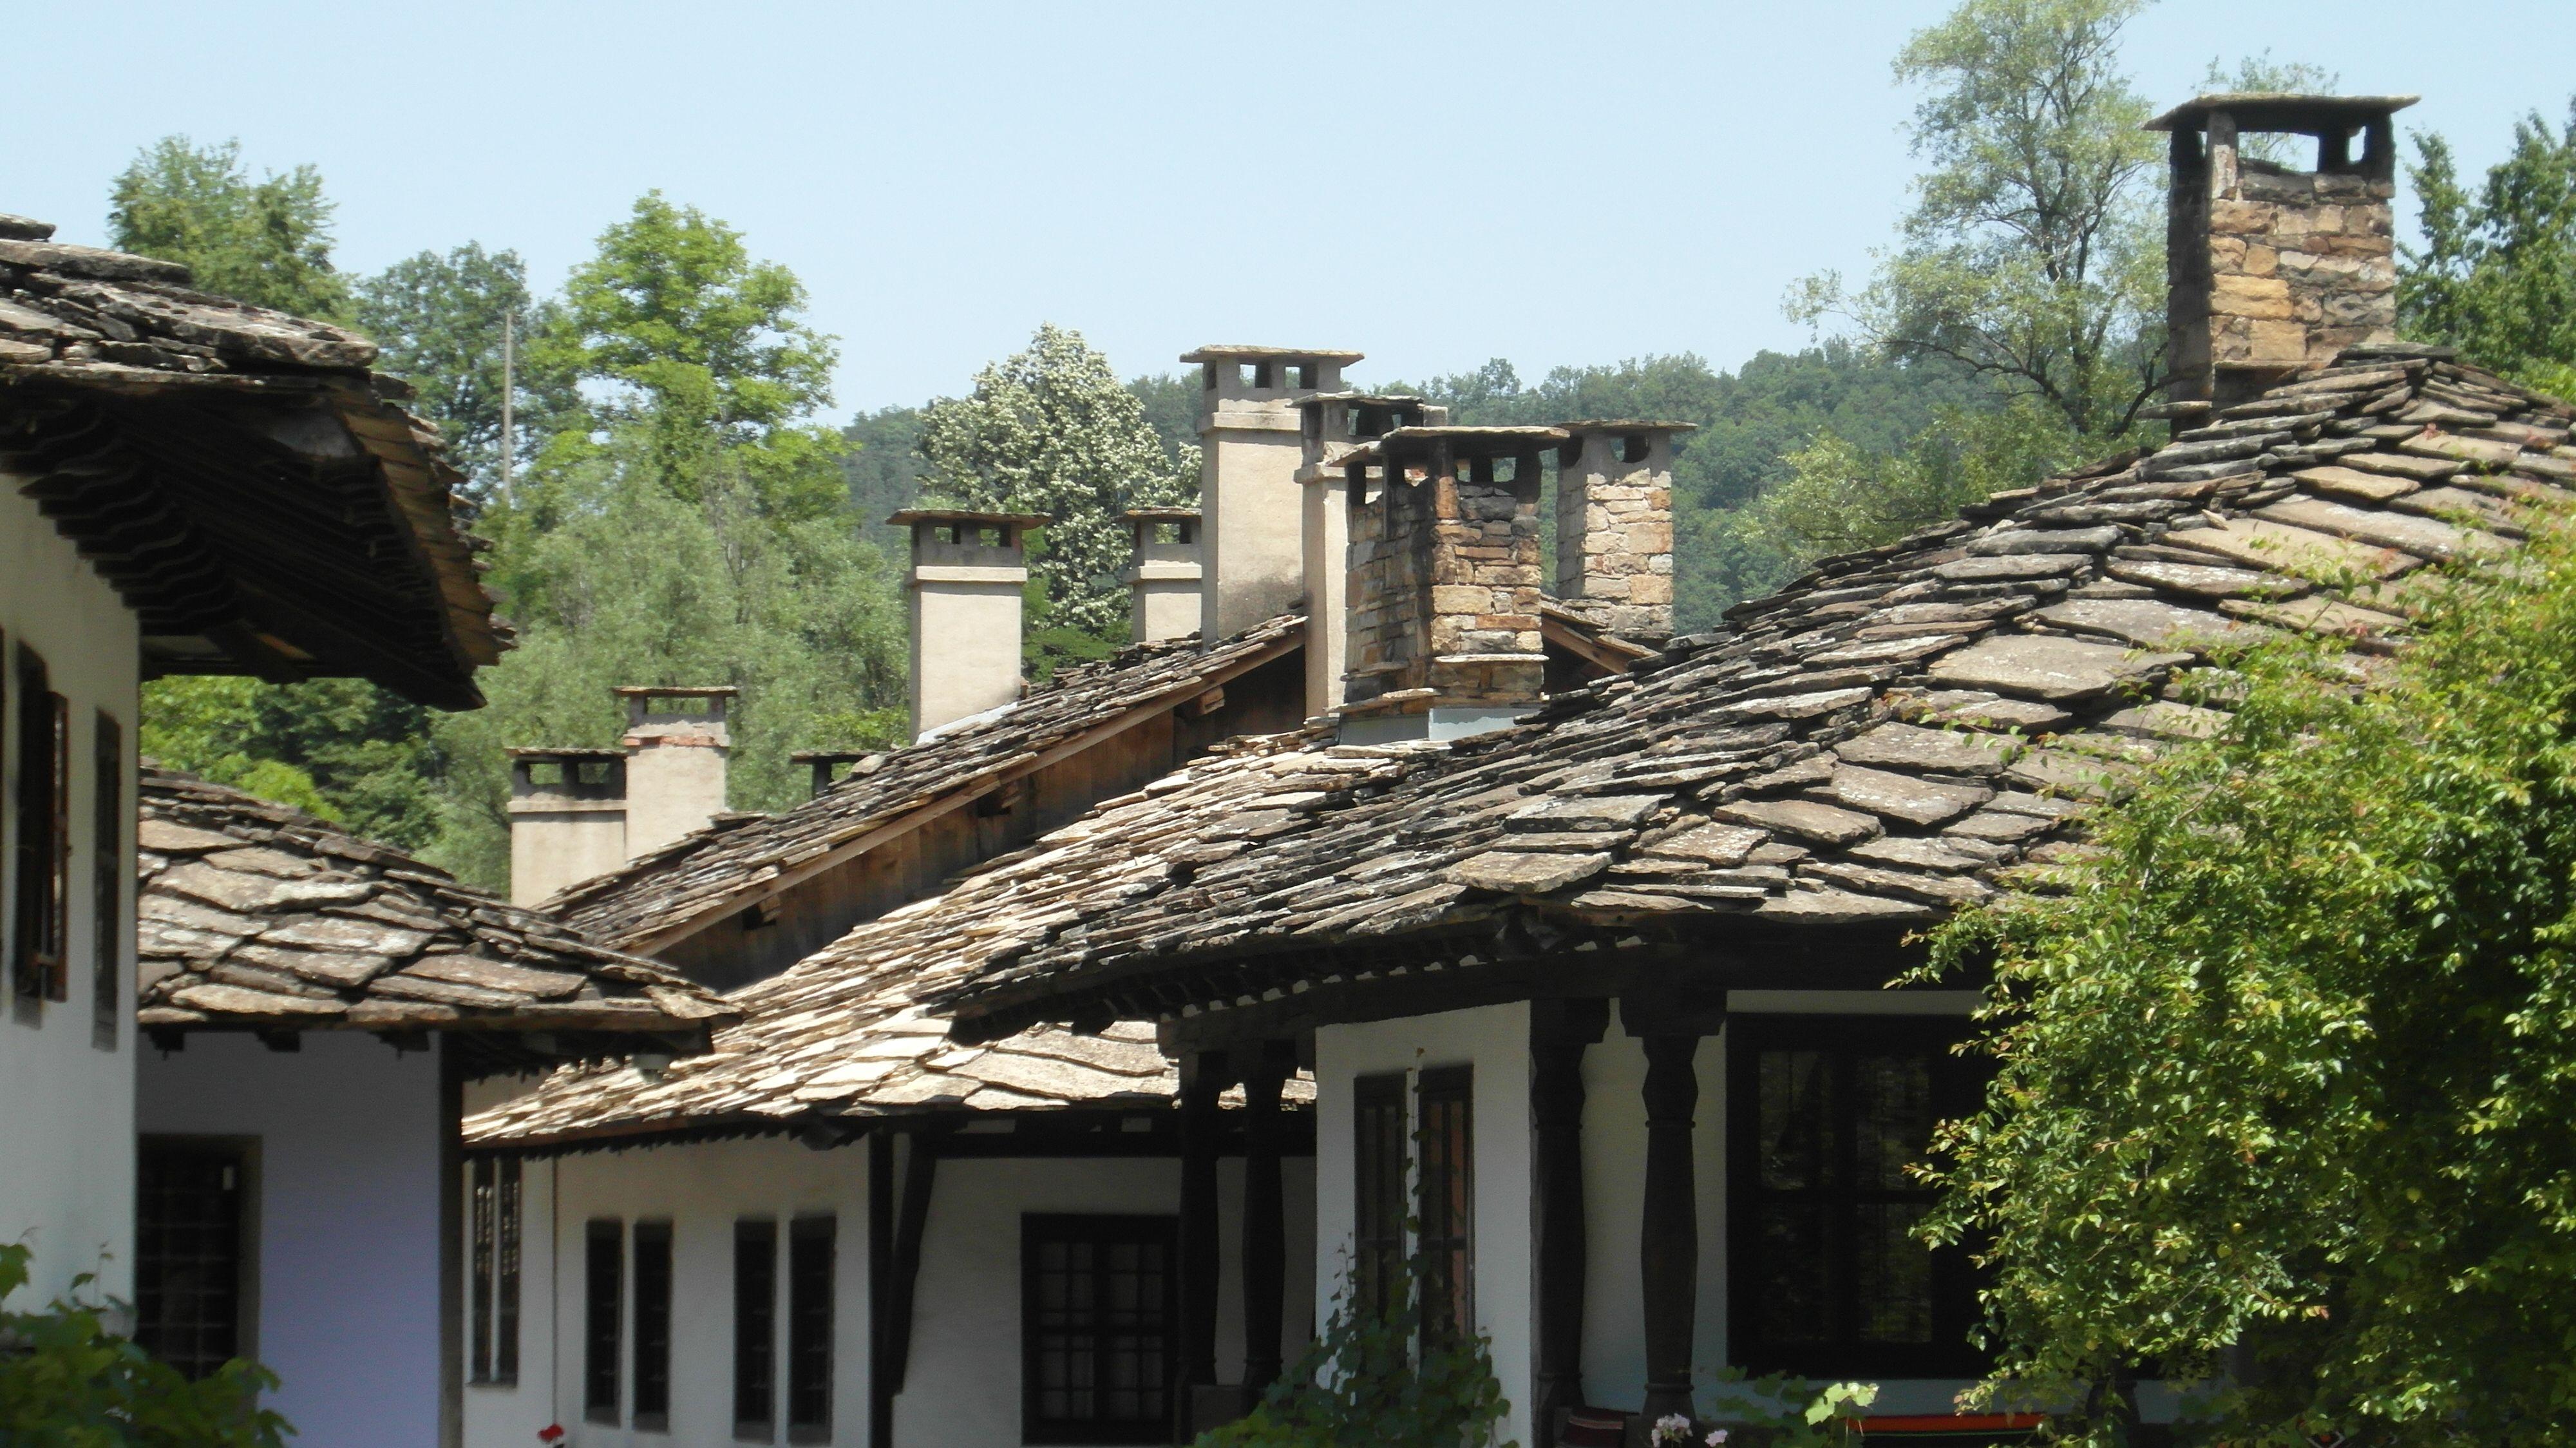 Etar Ethnographic centre near Gabrovo